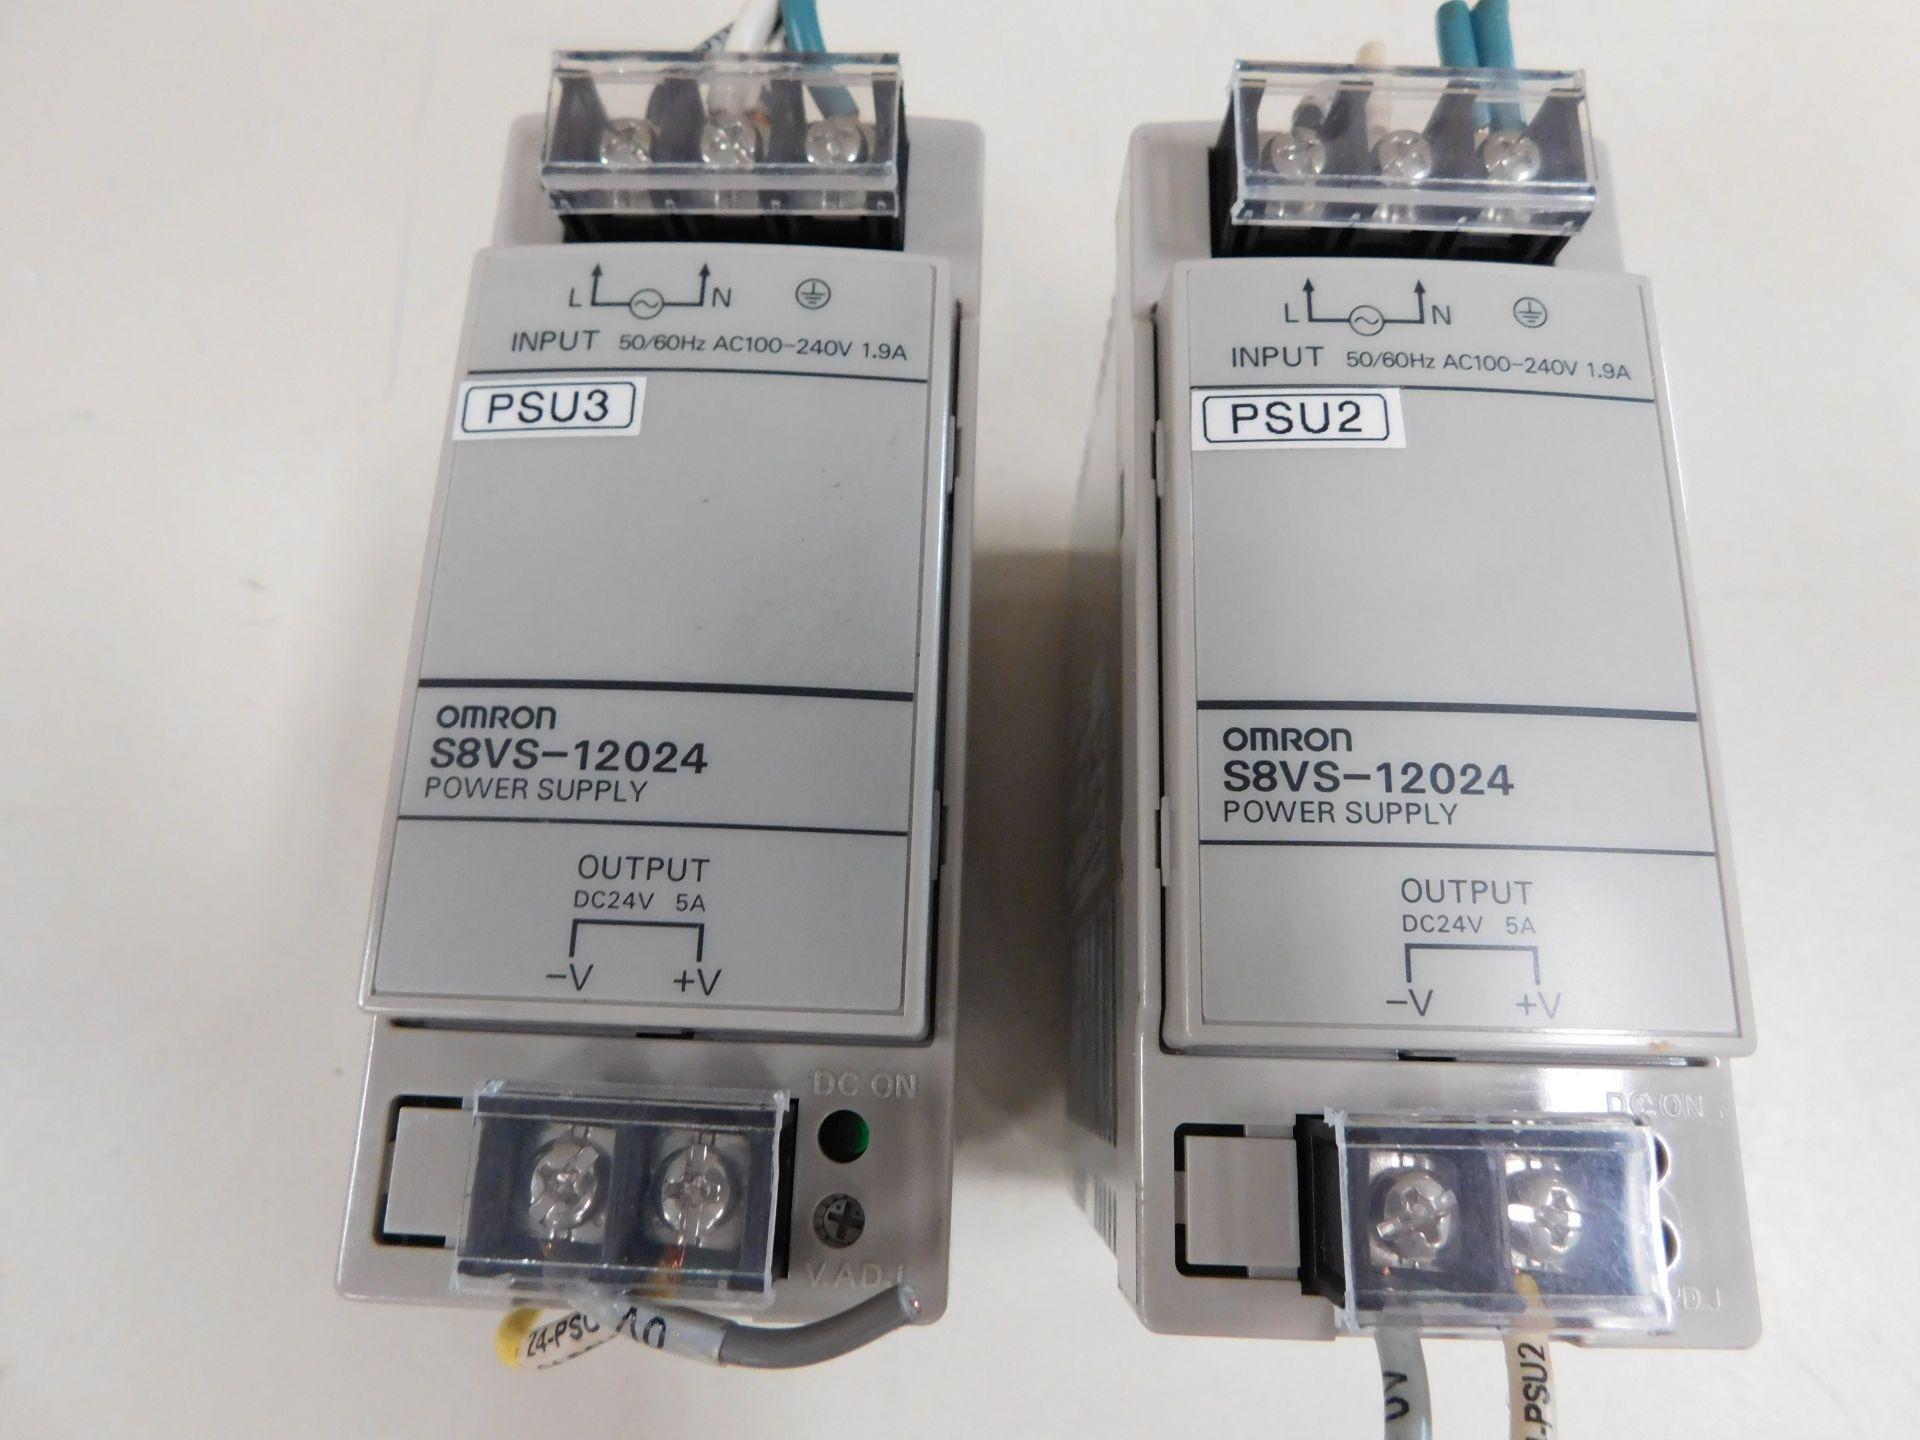 Lot 105 - OMRON S8VS-12024 POWER SUPPLY